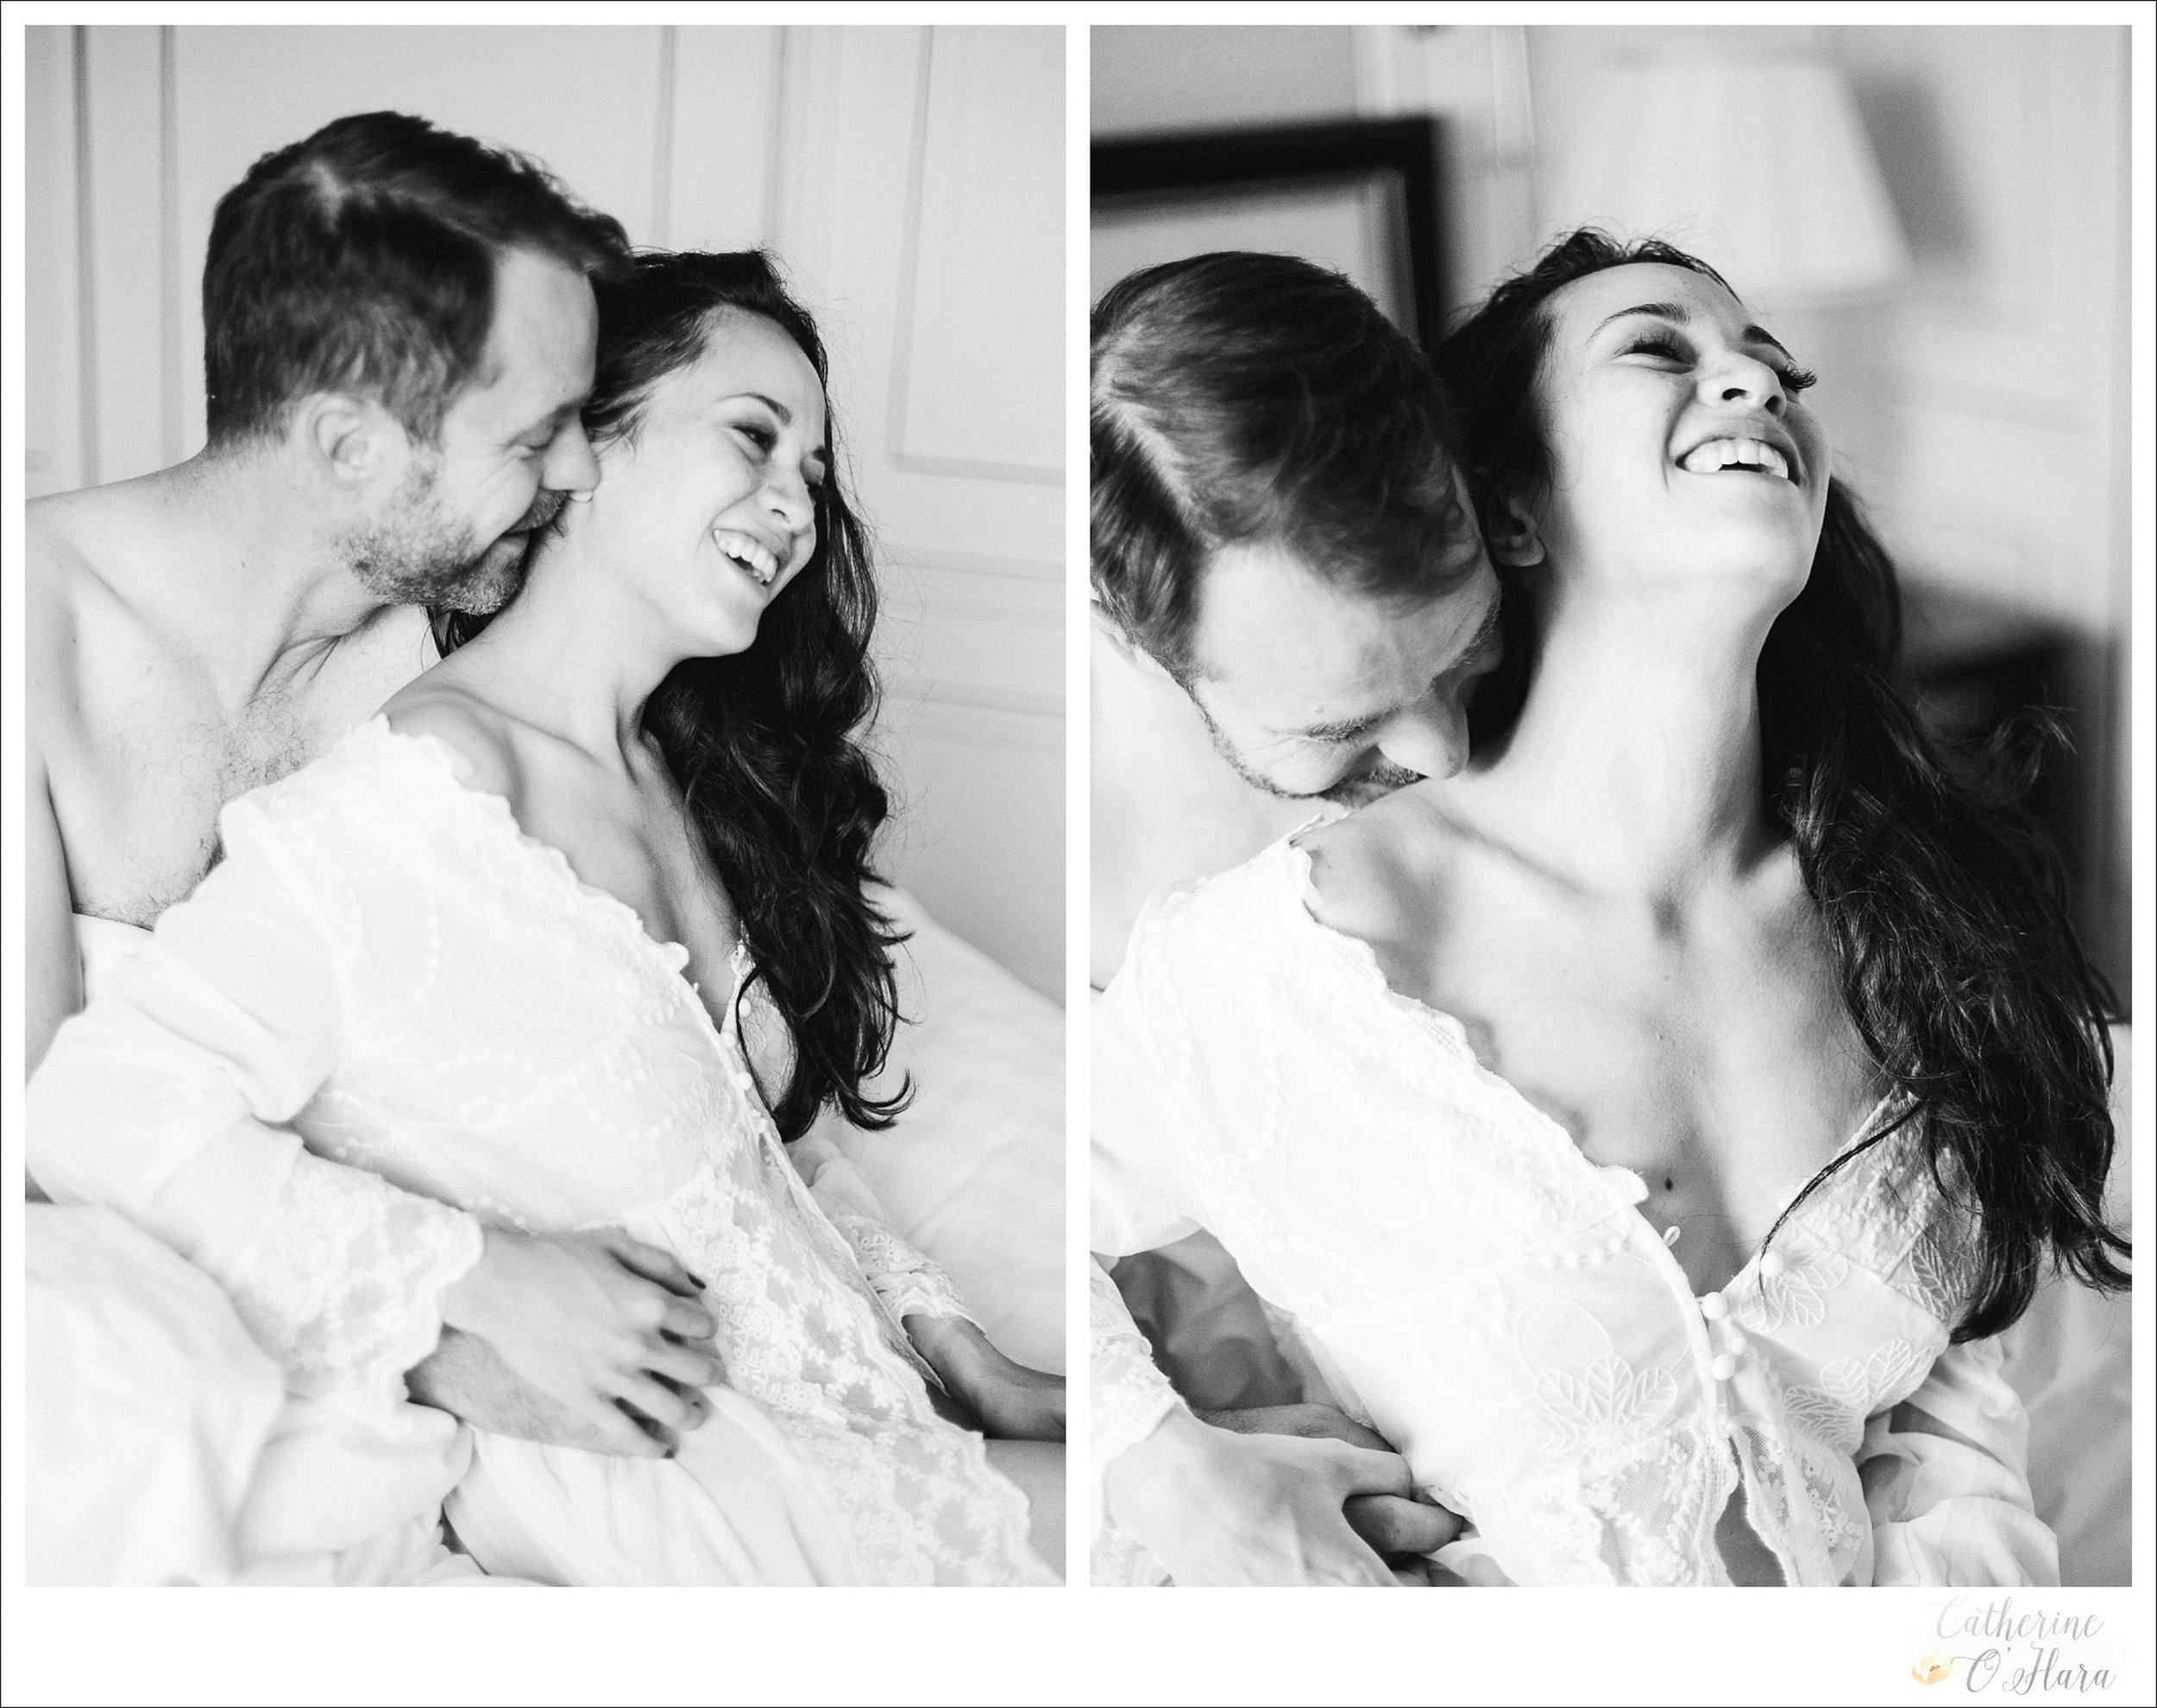 10-paris-couples-boudoir-photographer.jpg